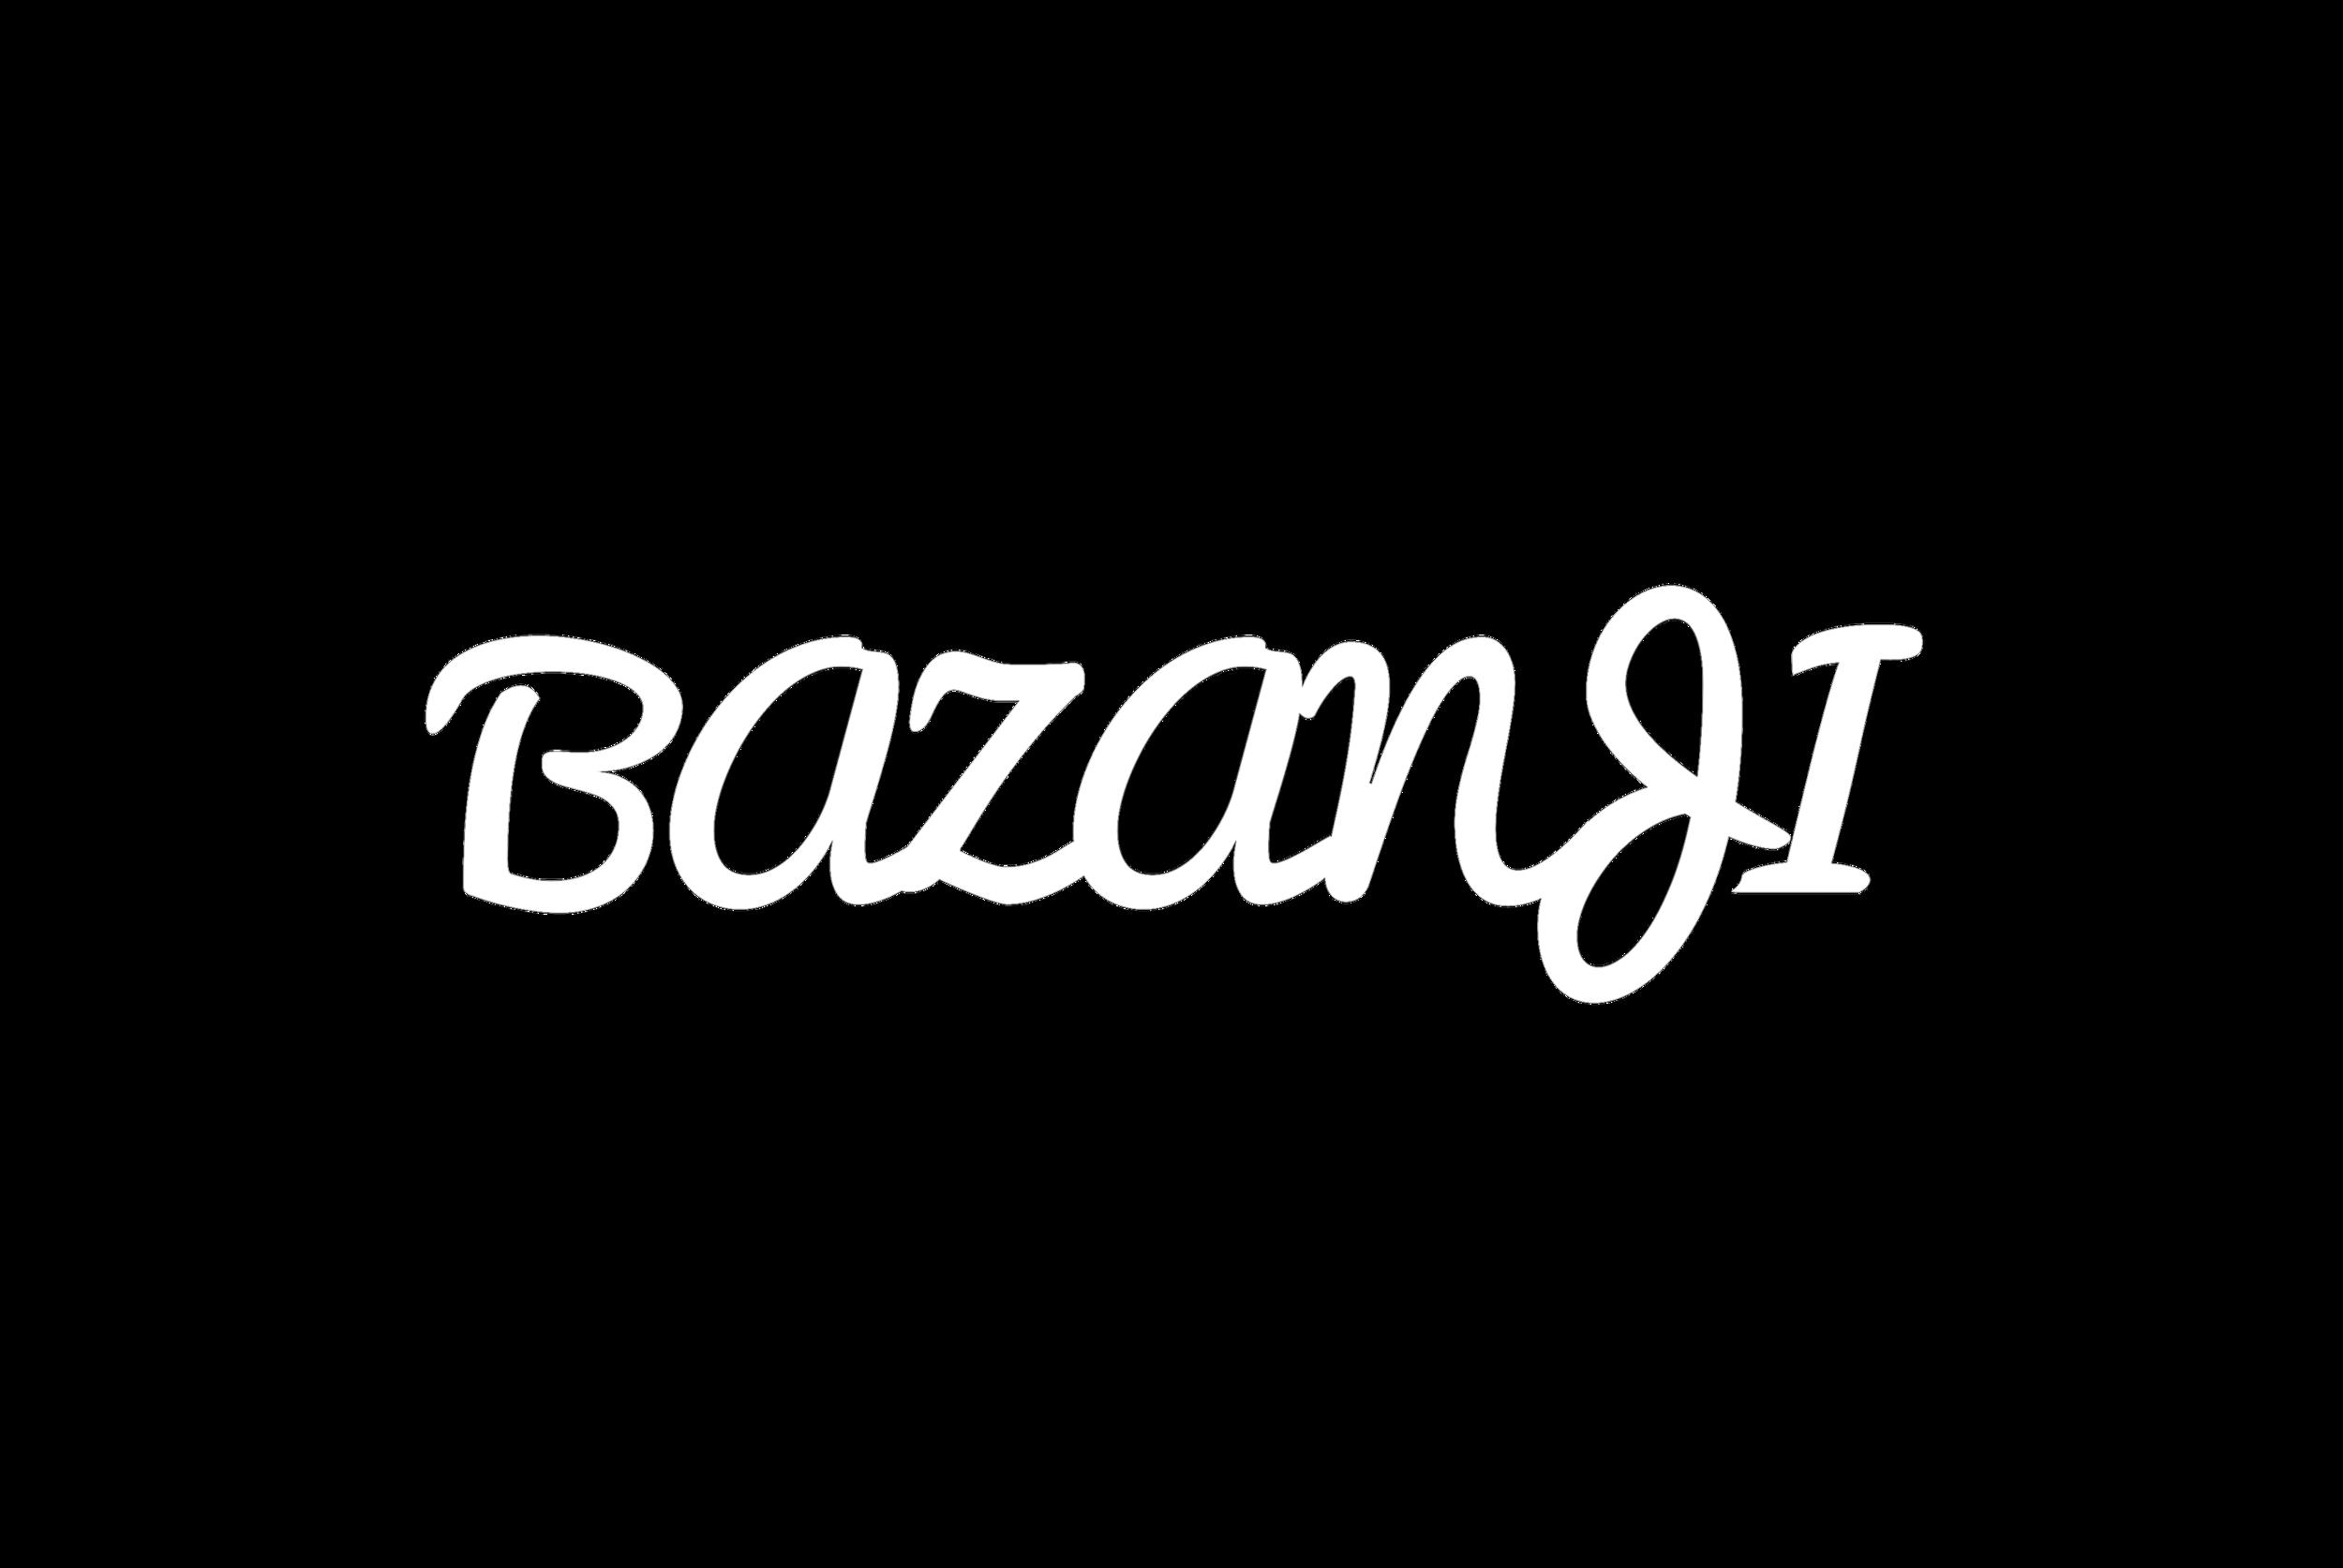 Bazanji White Transparent copy.png